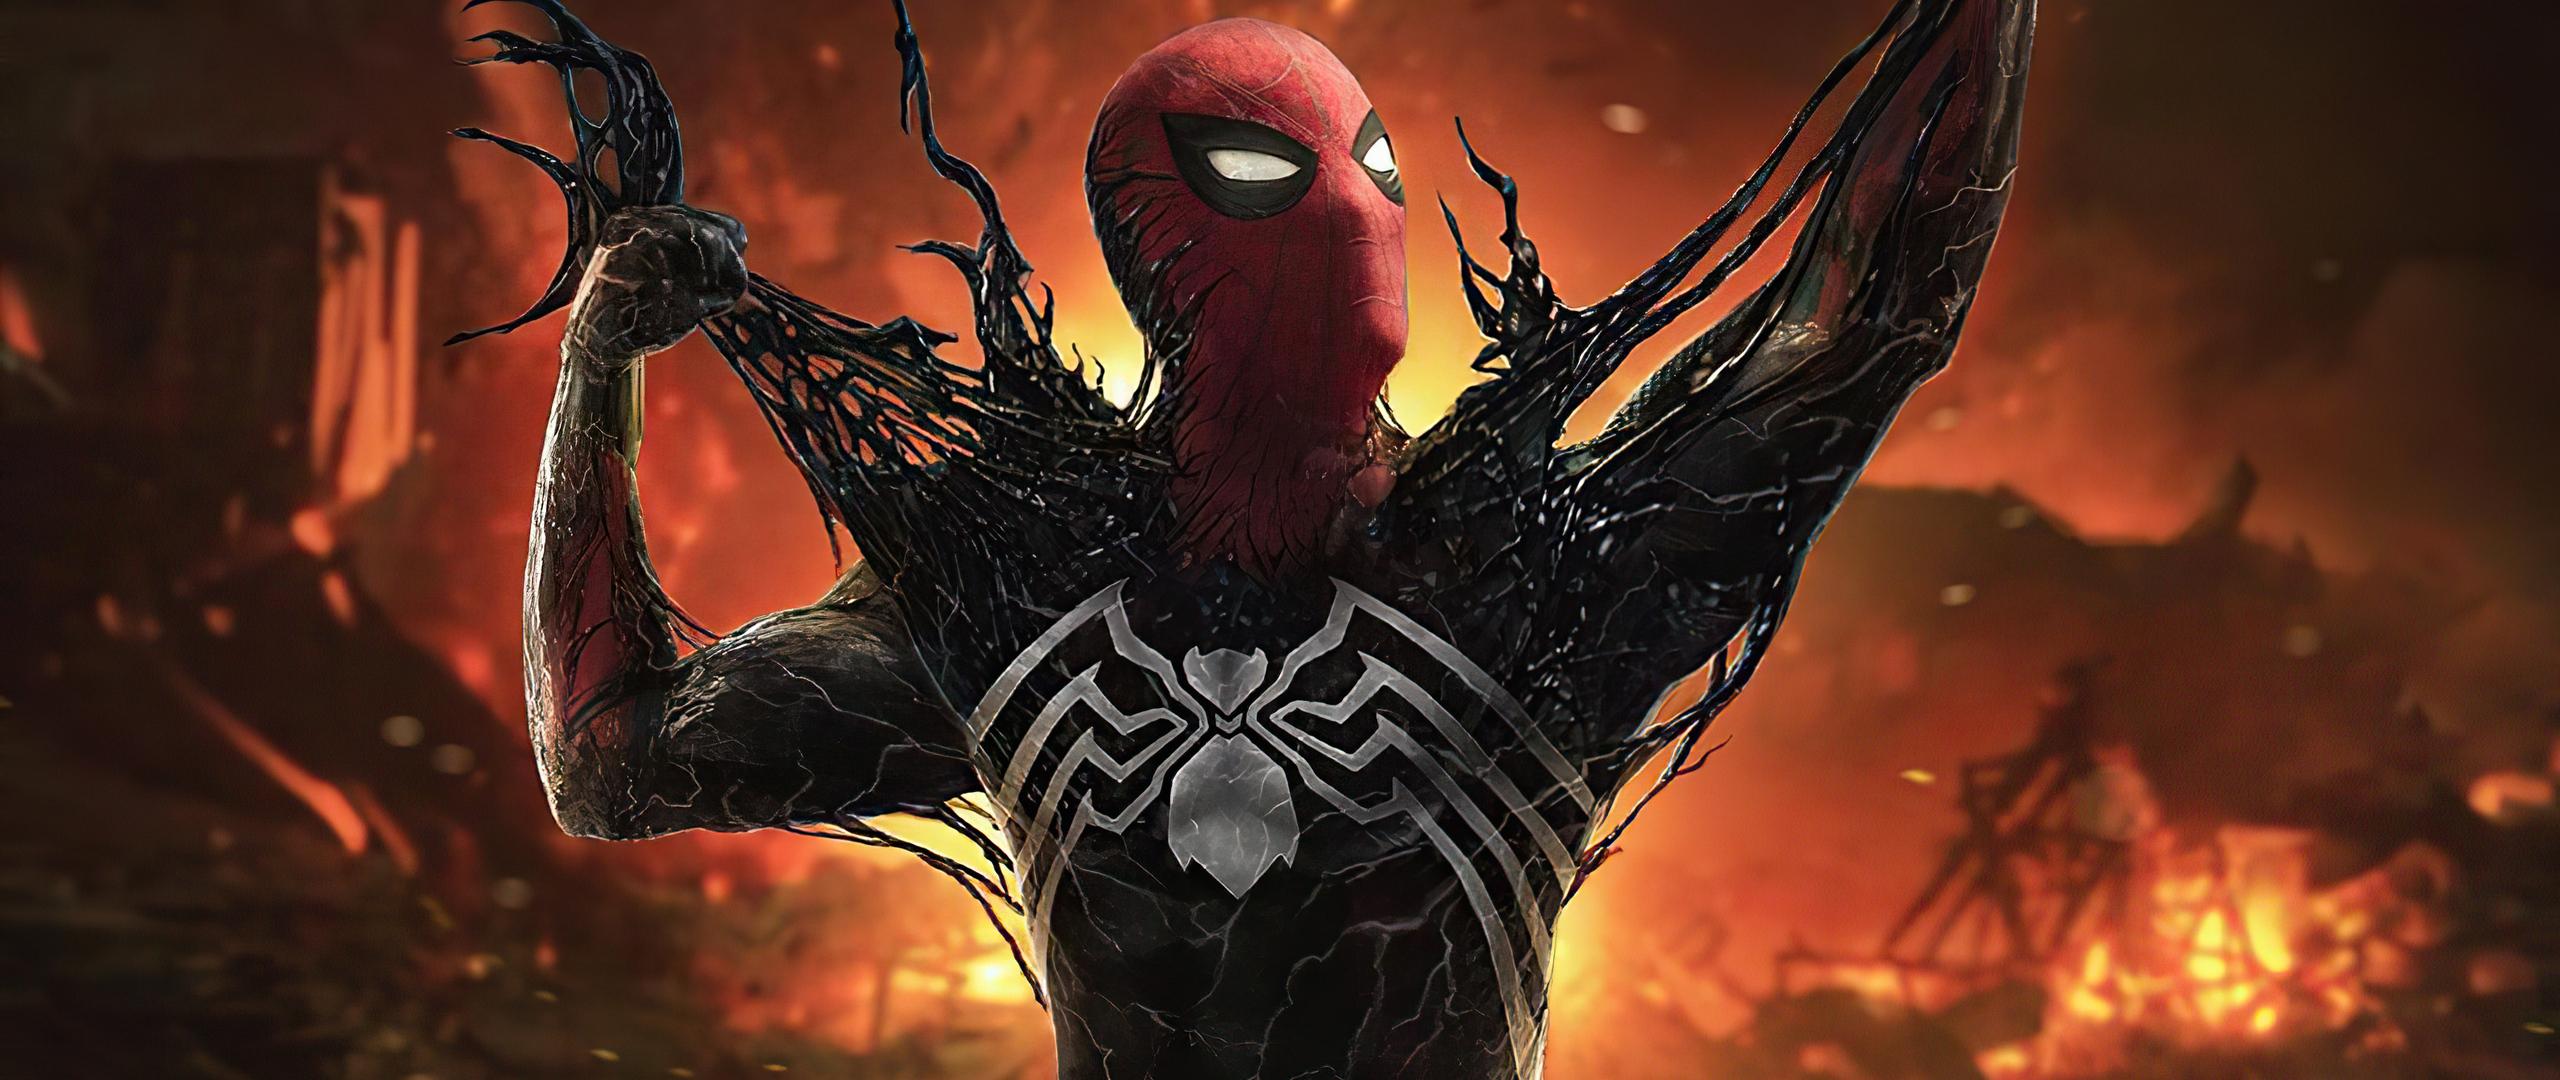 2560x1080 Symbiote Spiderman 4k 2560x1080 Resolution HD 4k ...